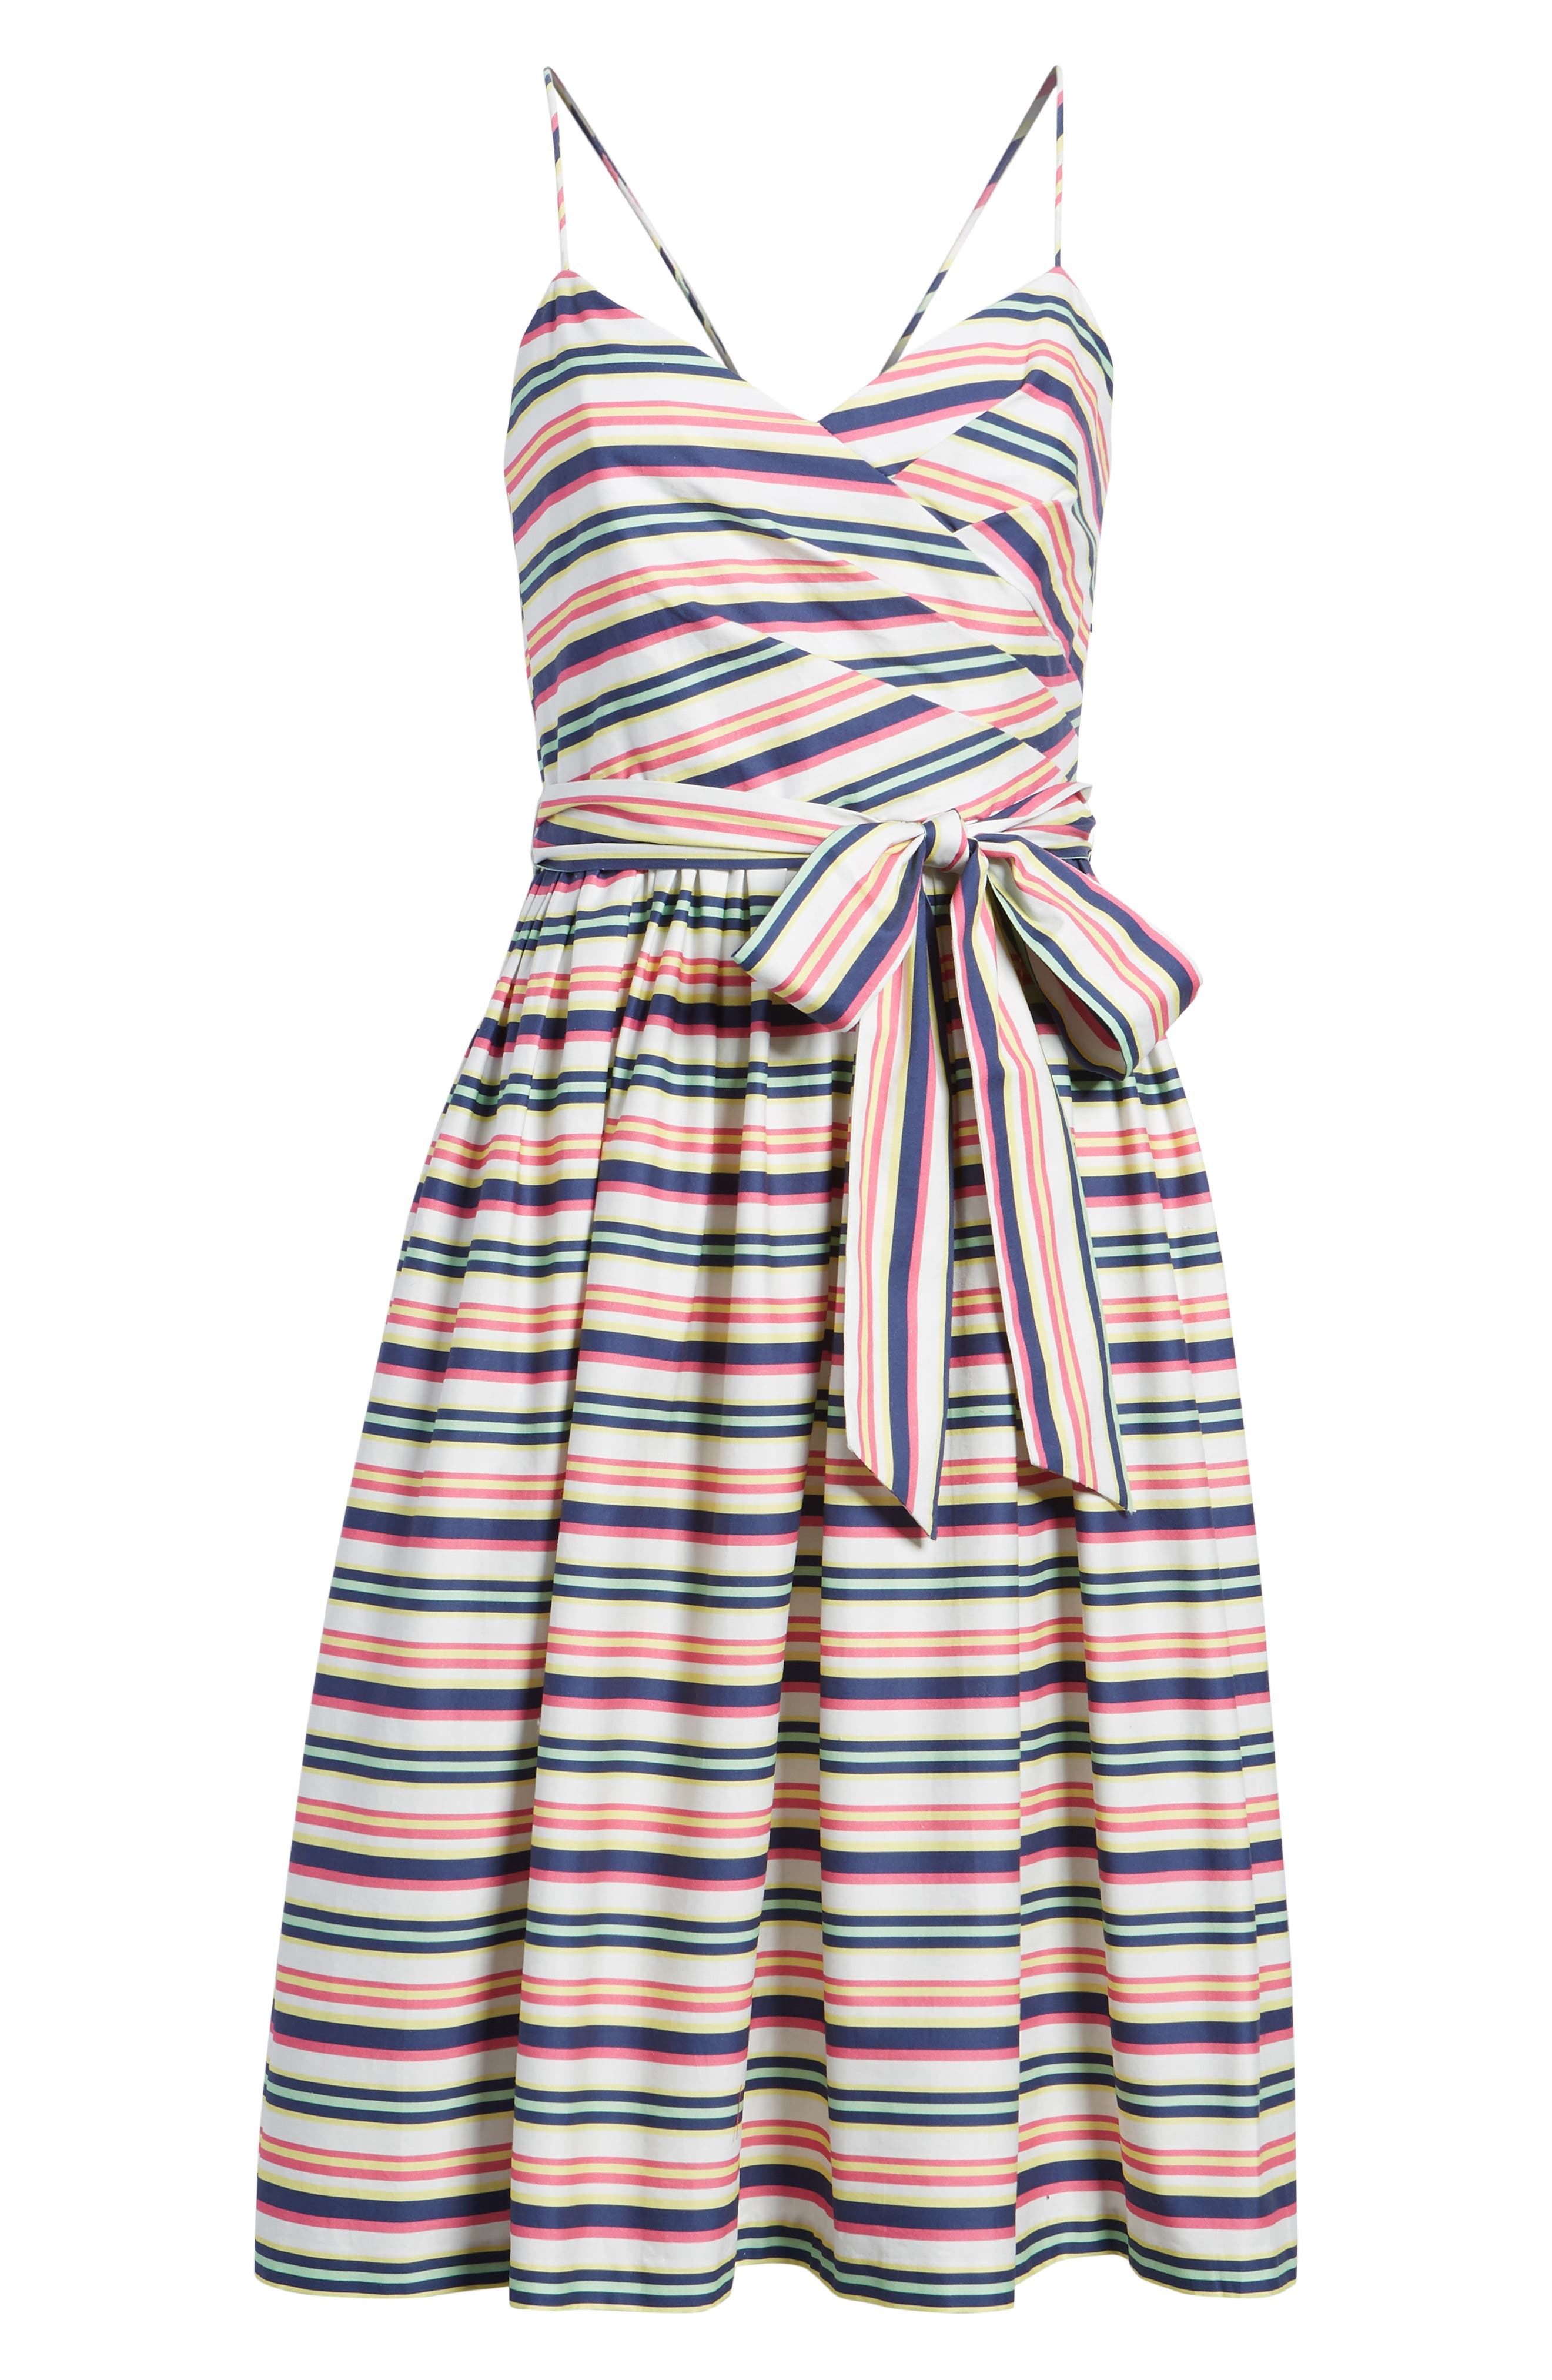 Stripe Strappy Cotton Dress,                             Alternate thumbnail 6, color,                             NAVY PINK COMBO STRIPE